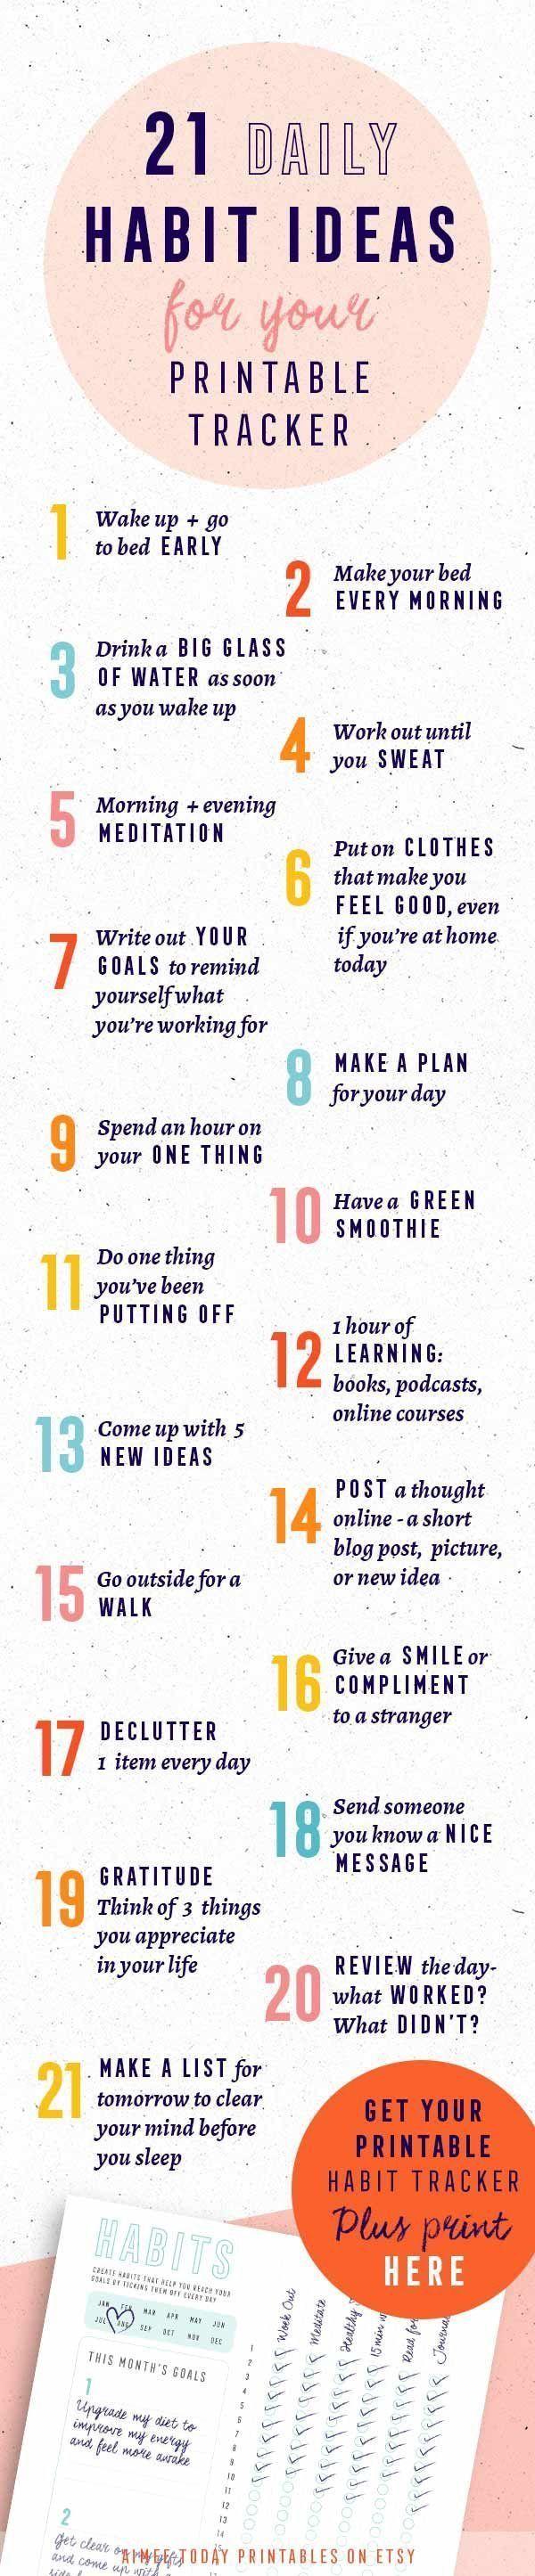 Daily Habit Ideas